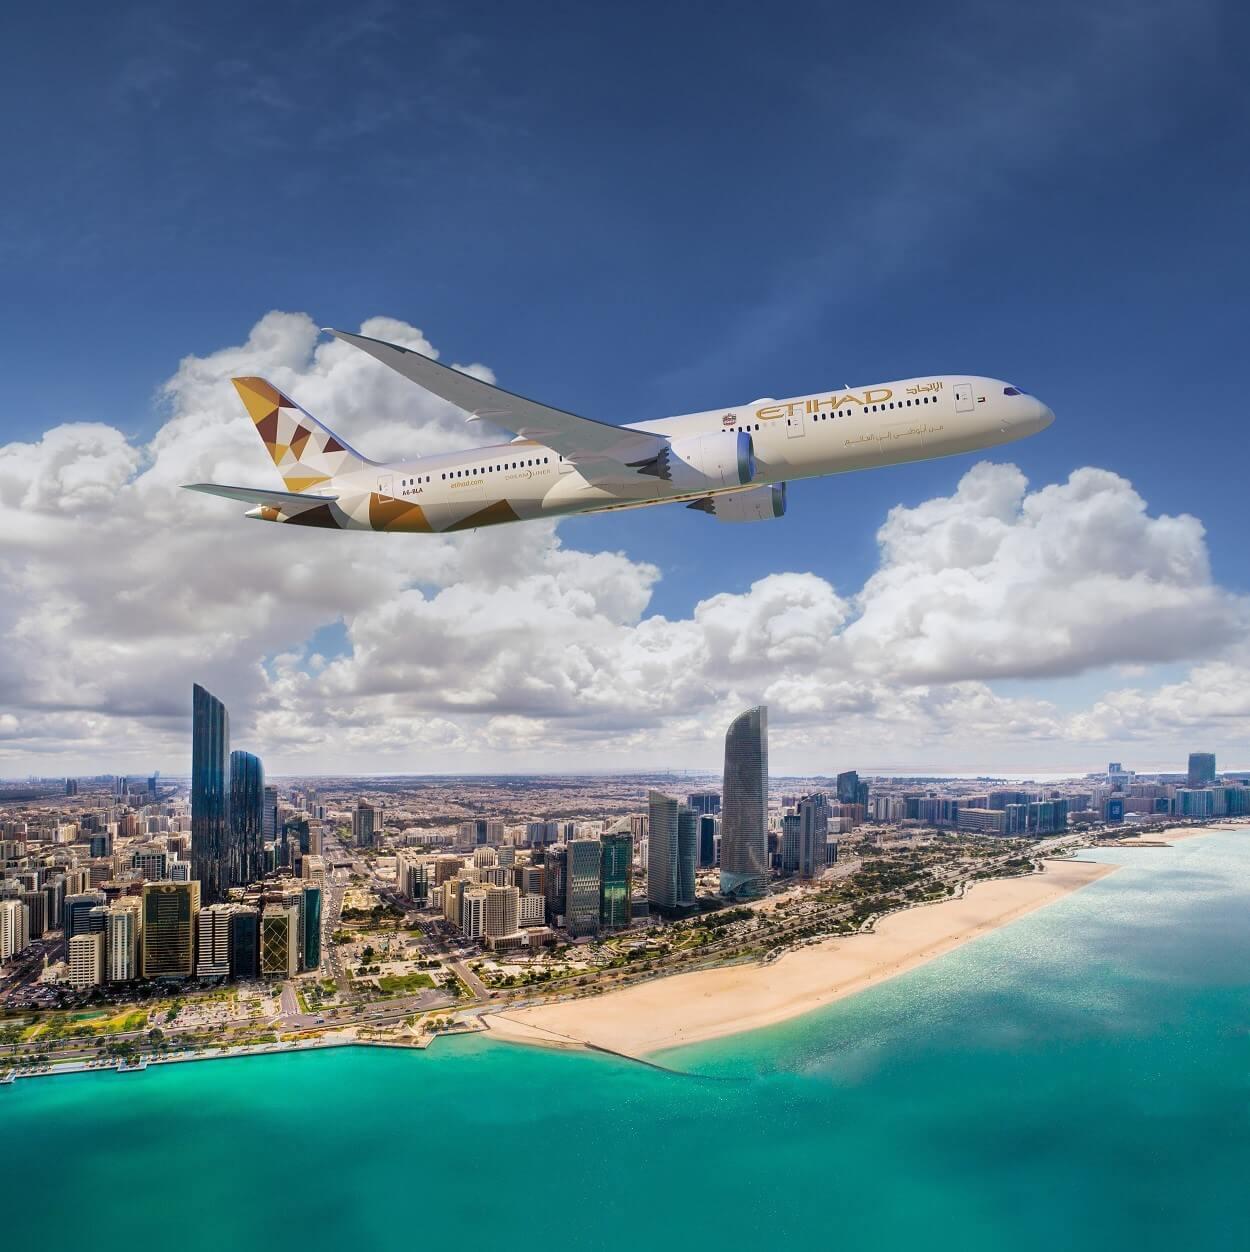 Etihad Airways refreshes loyalty program with rewards galore